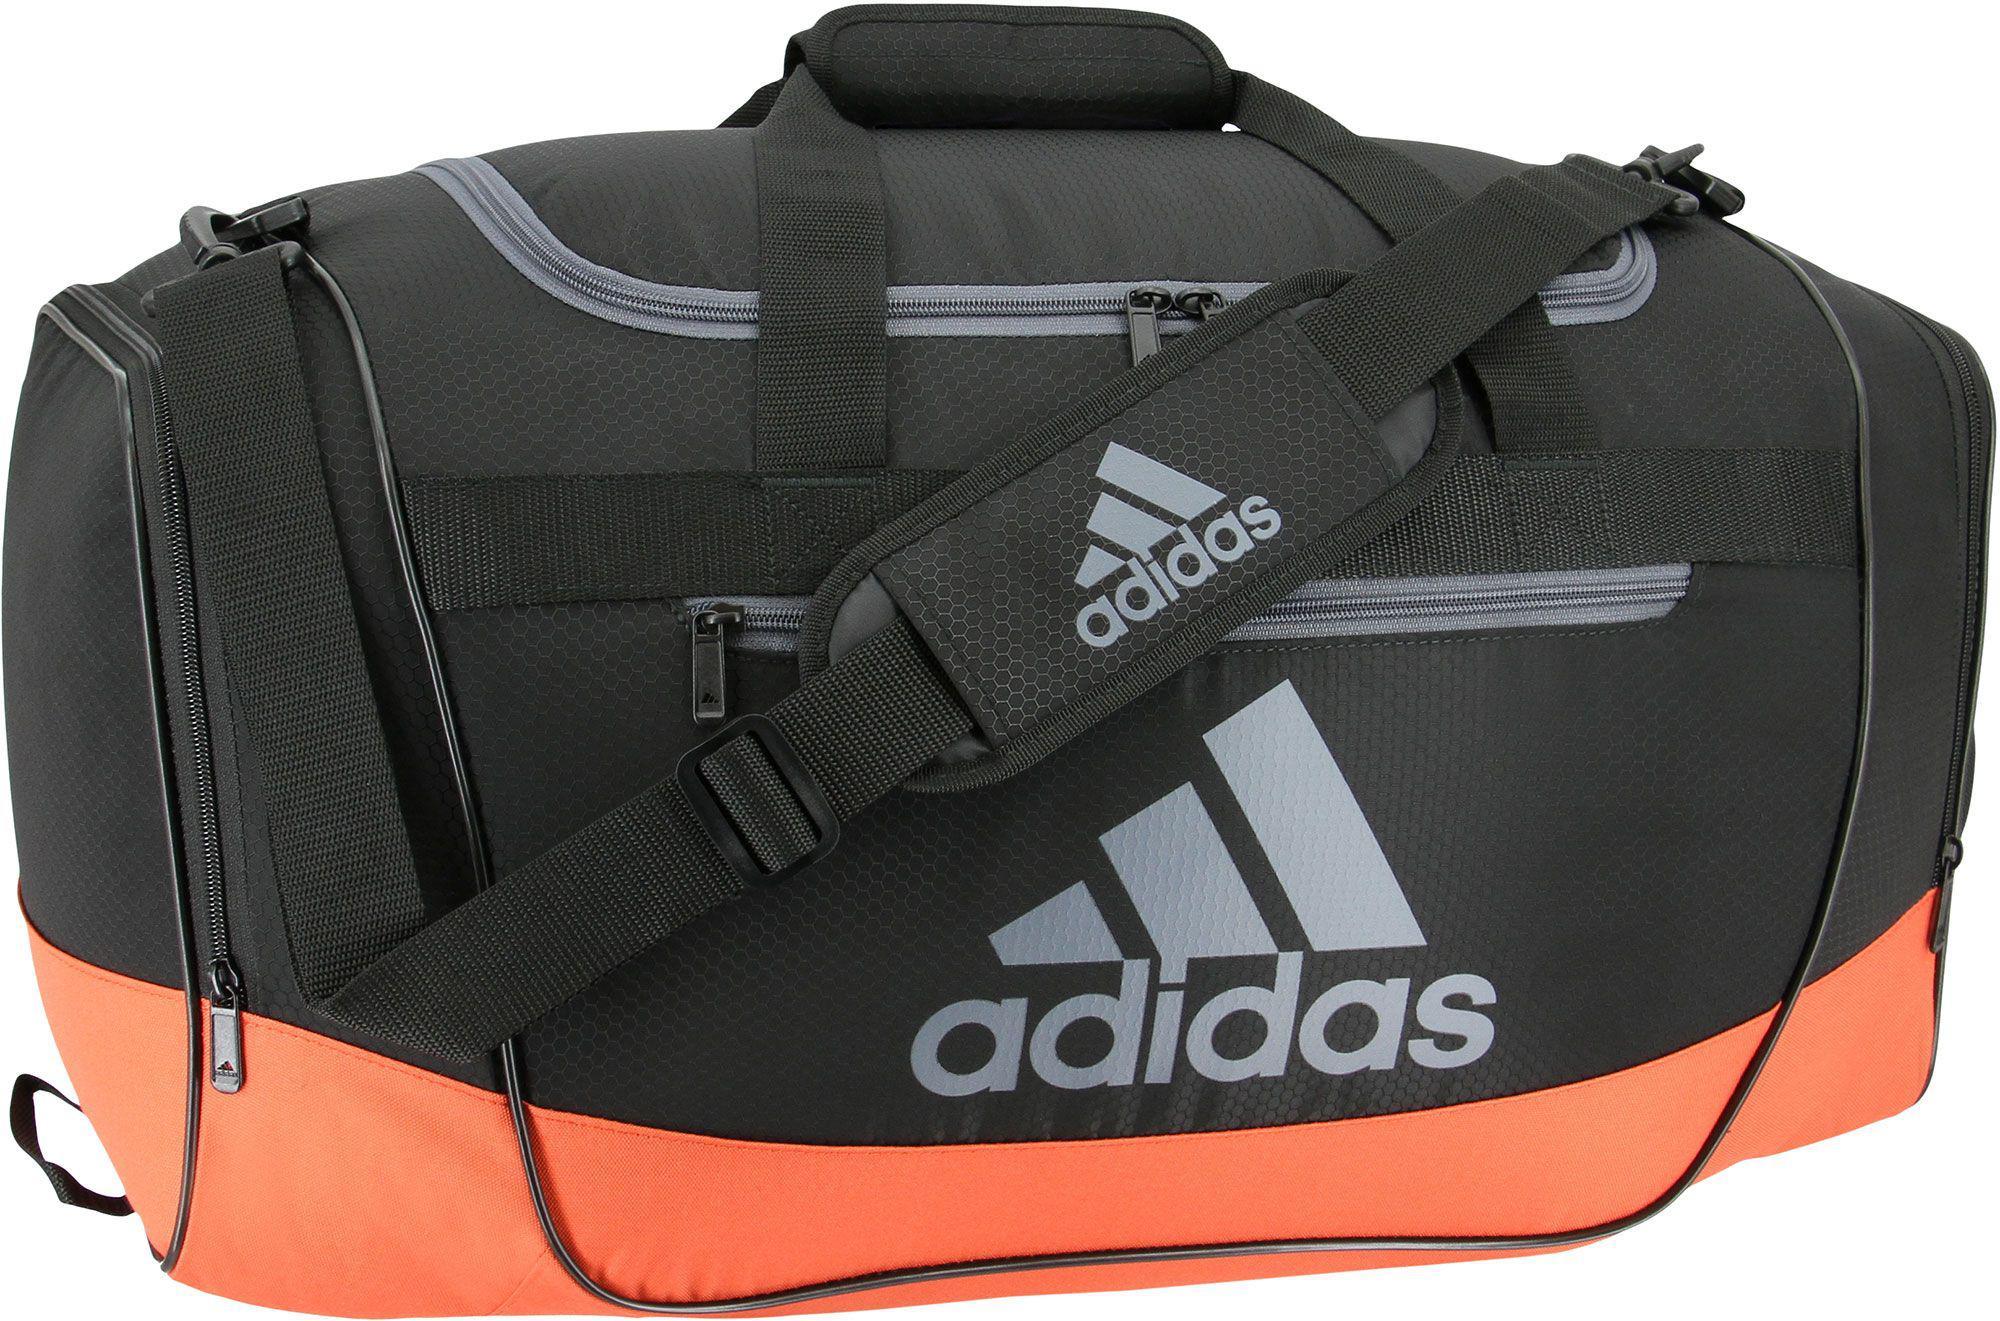 f631da7e39e4 Lyst - adidas Defender Iii Medium Duffle Bag in Black for Men